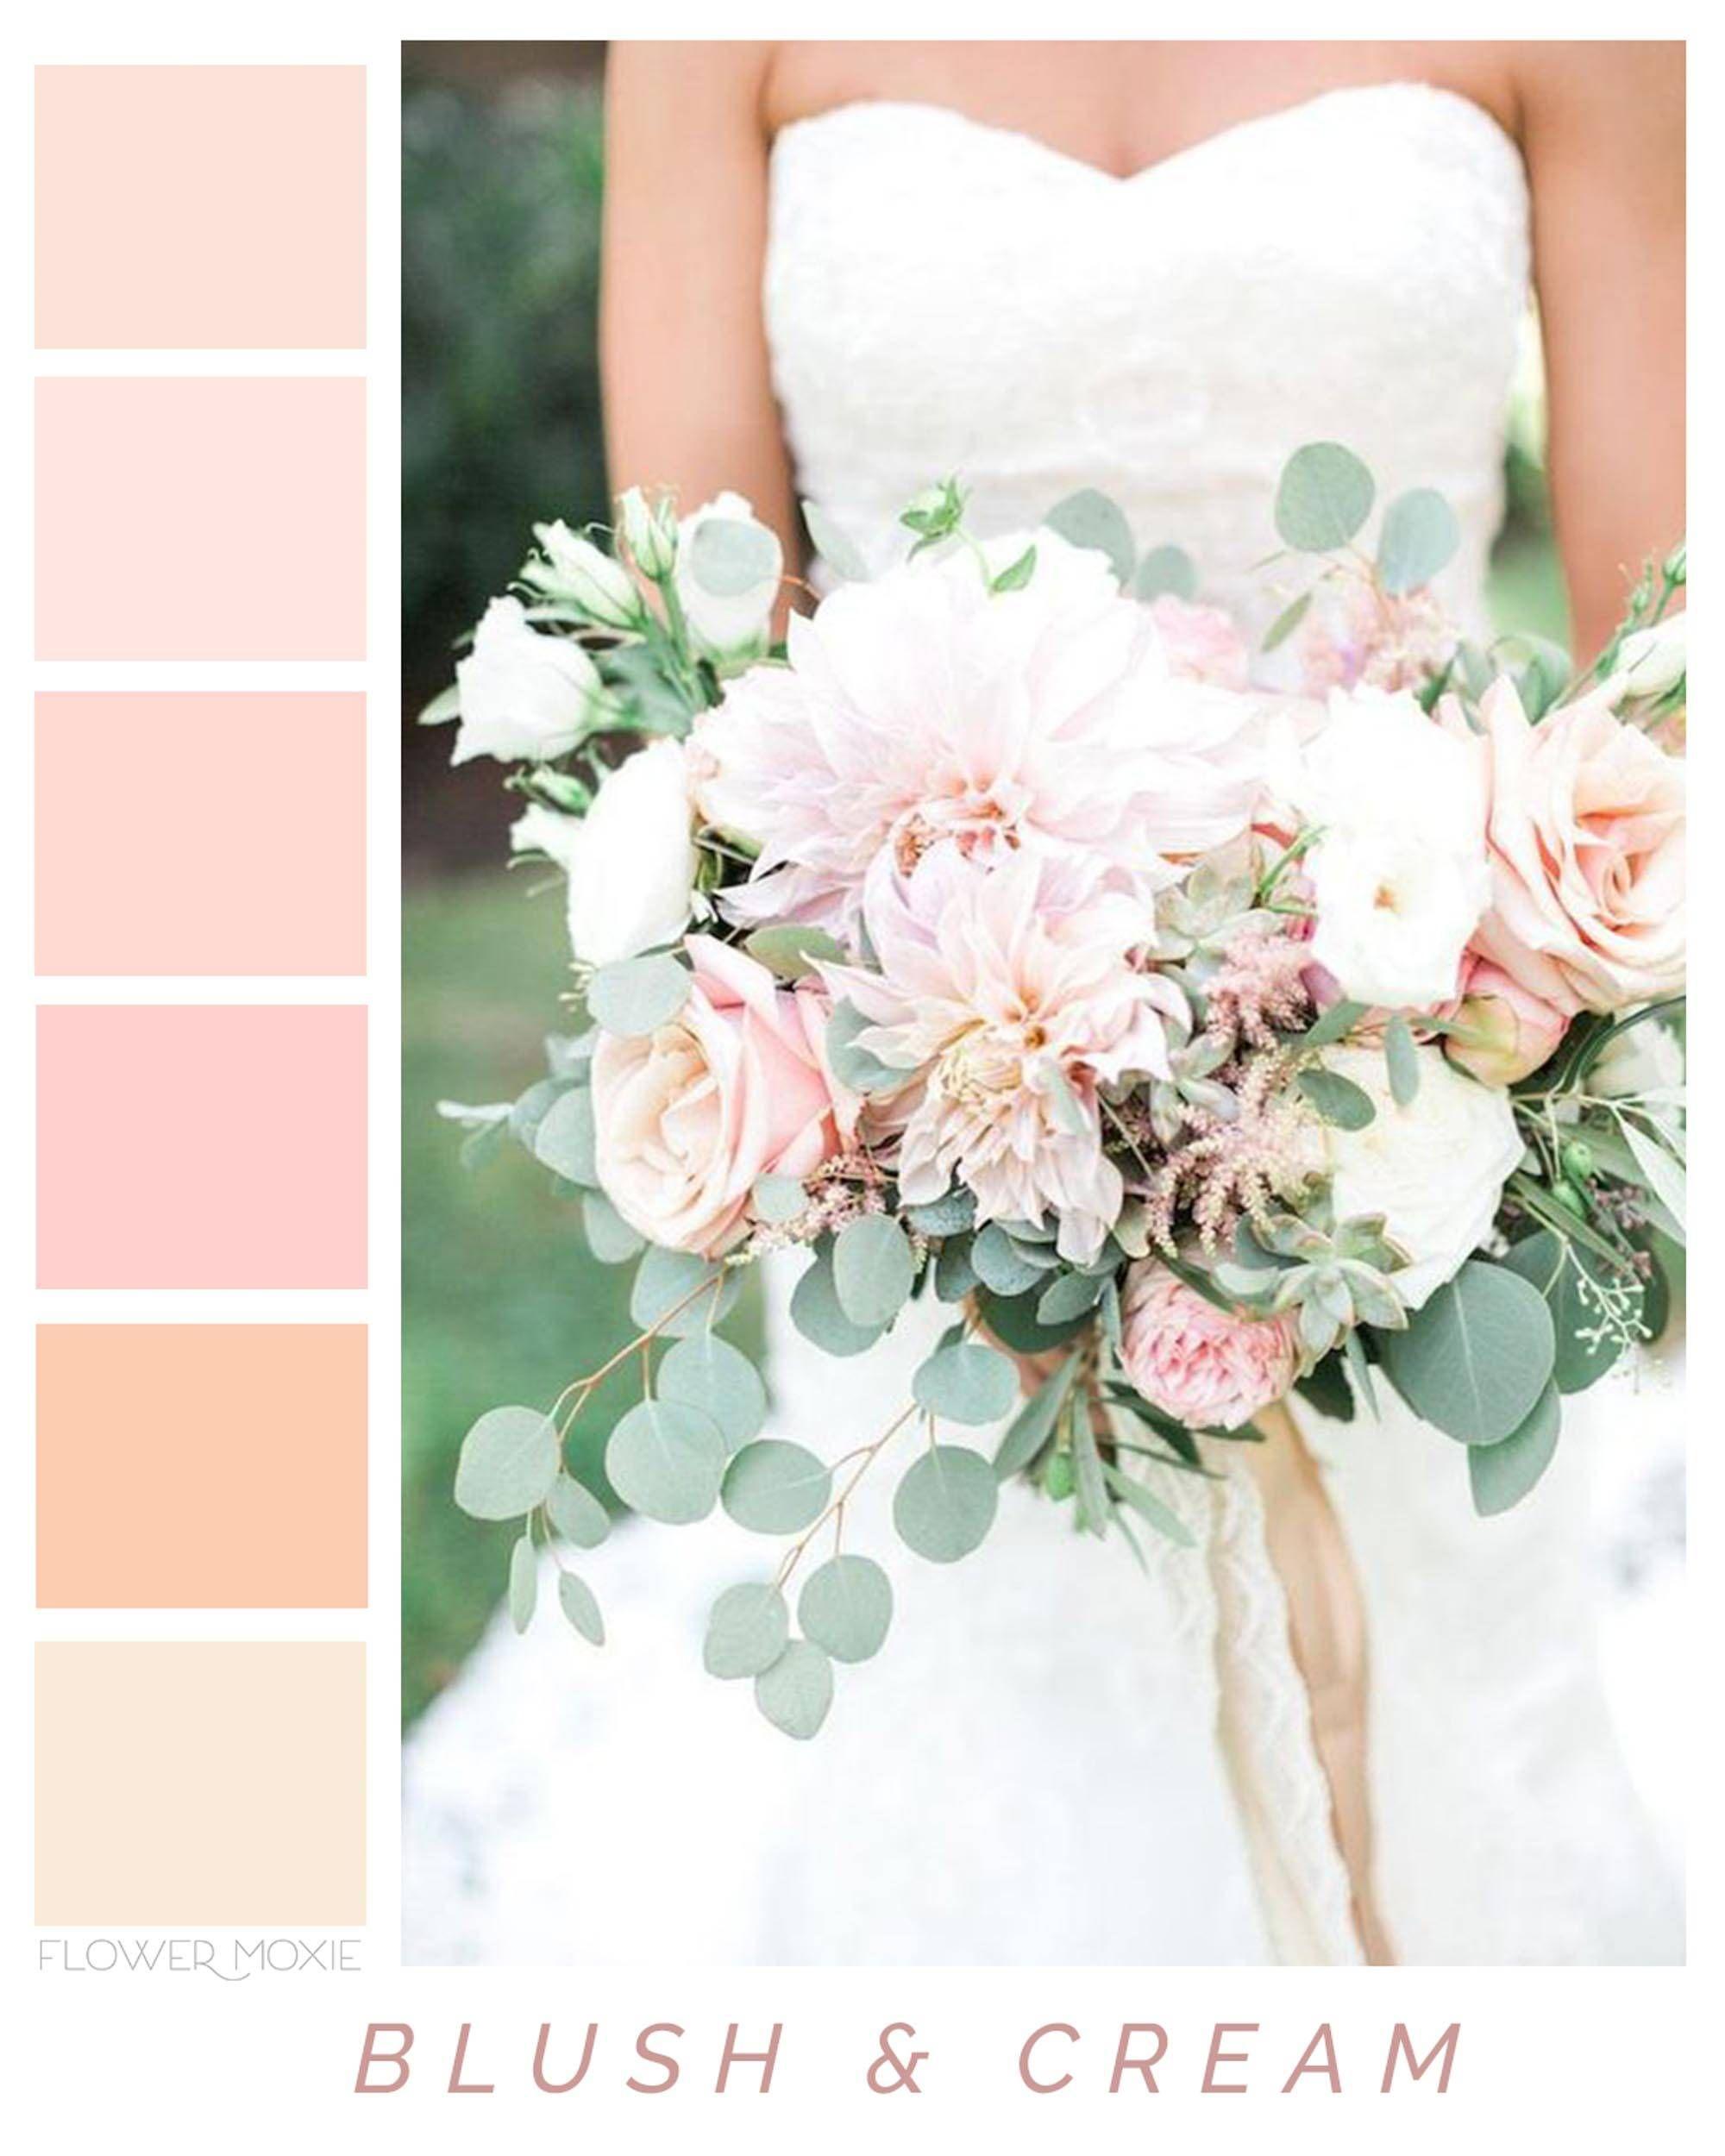 Wholesale Wedding Flower Packages: Moodboard-Inspired DIY Floral Packages For Weddings